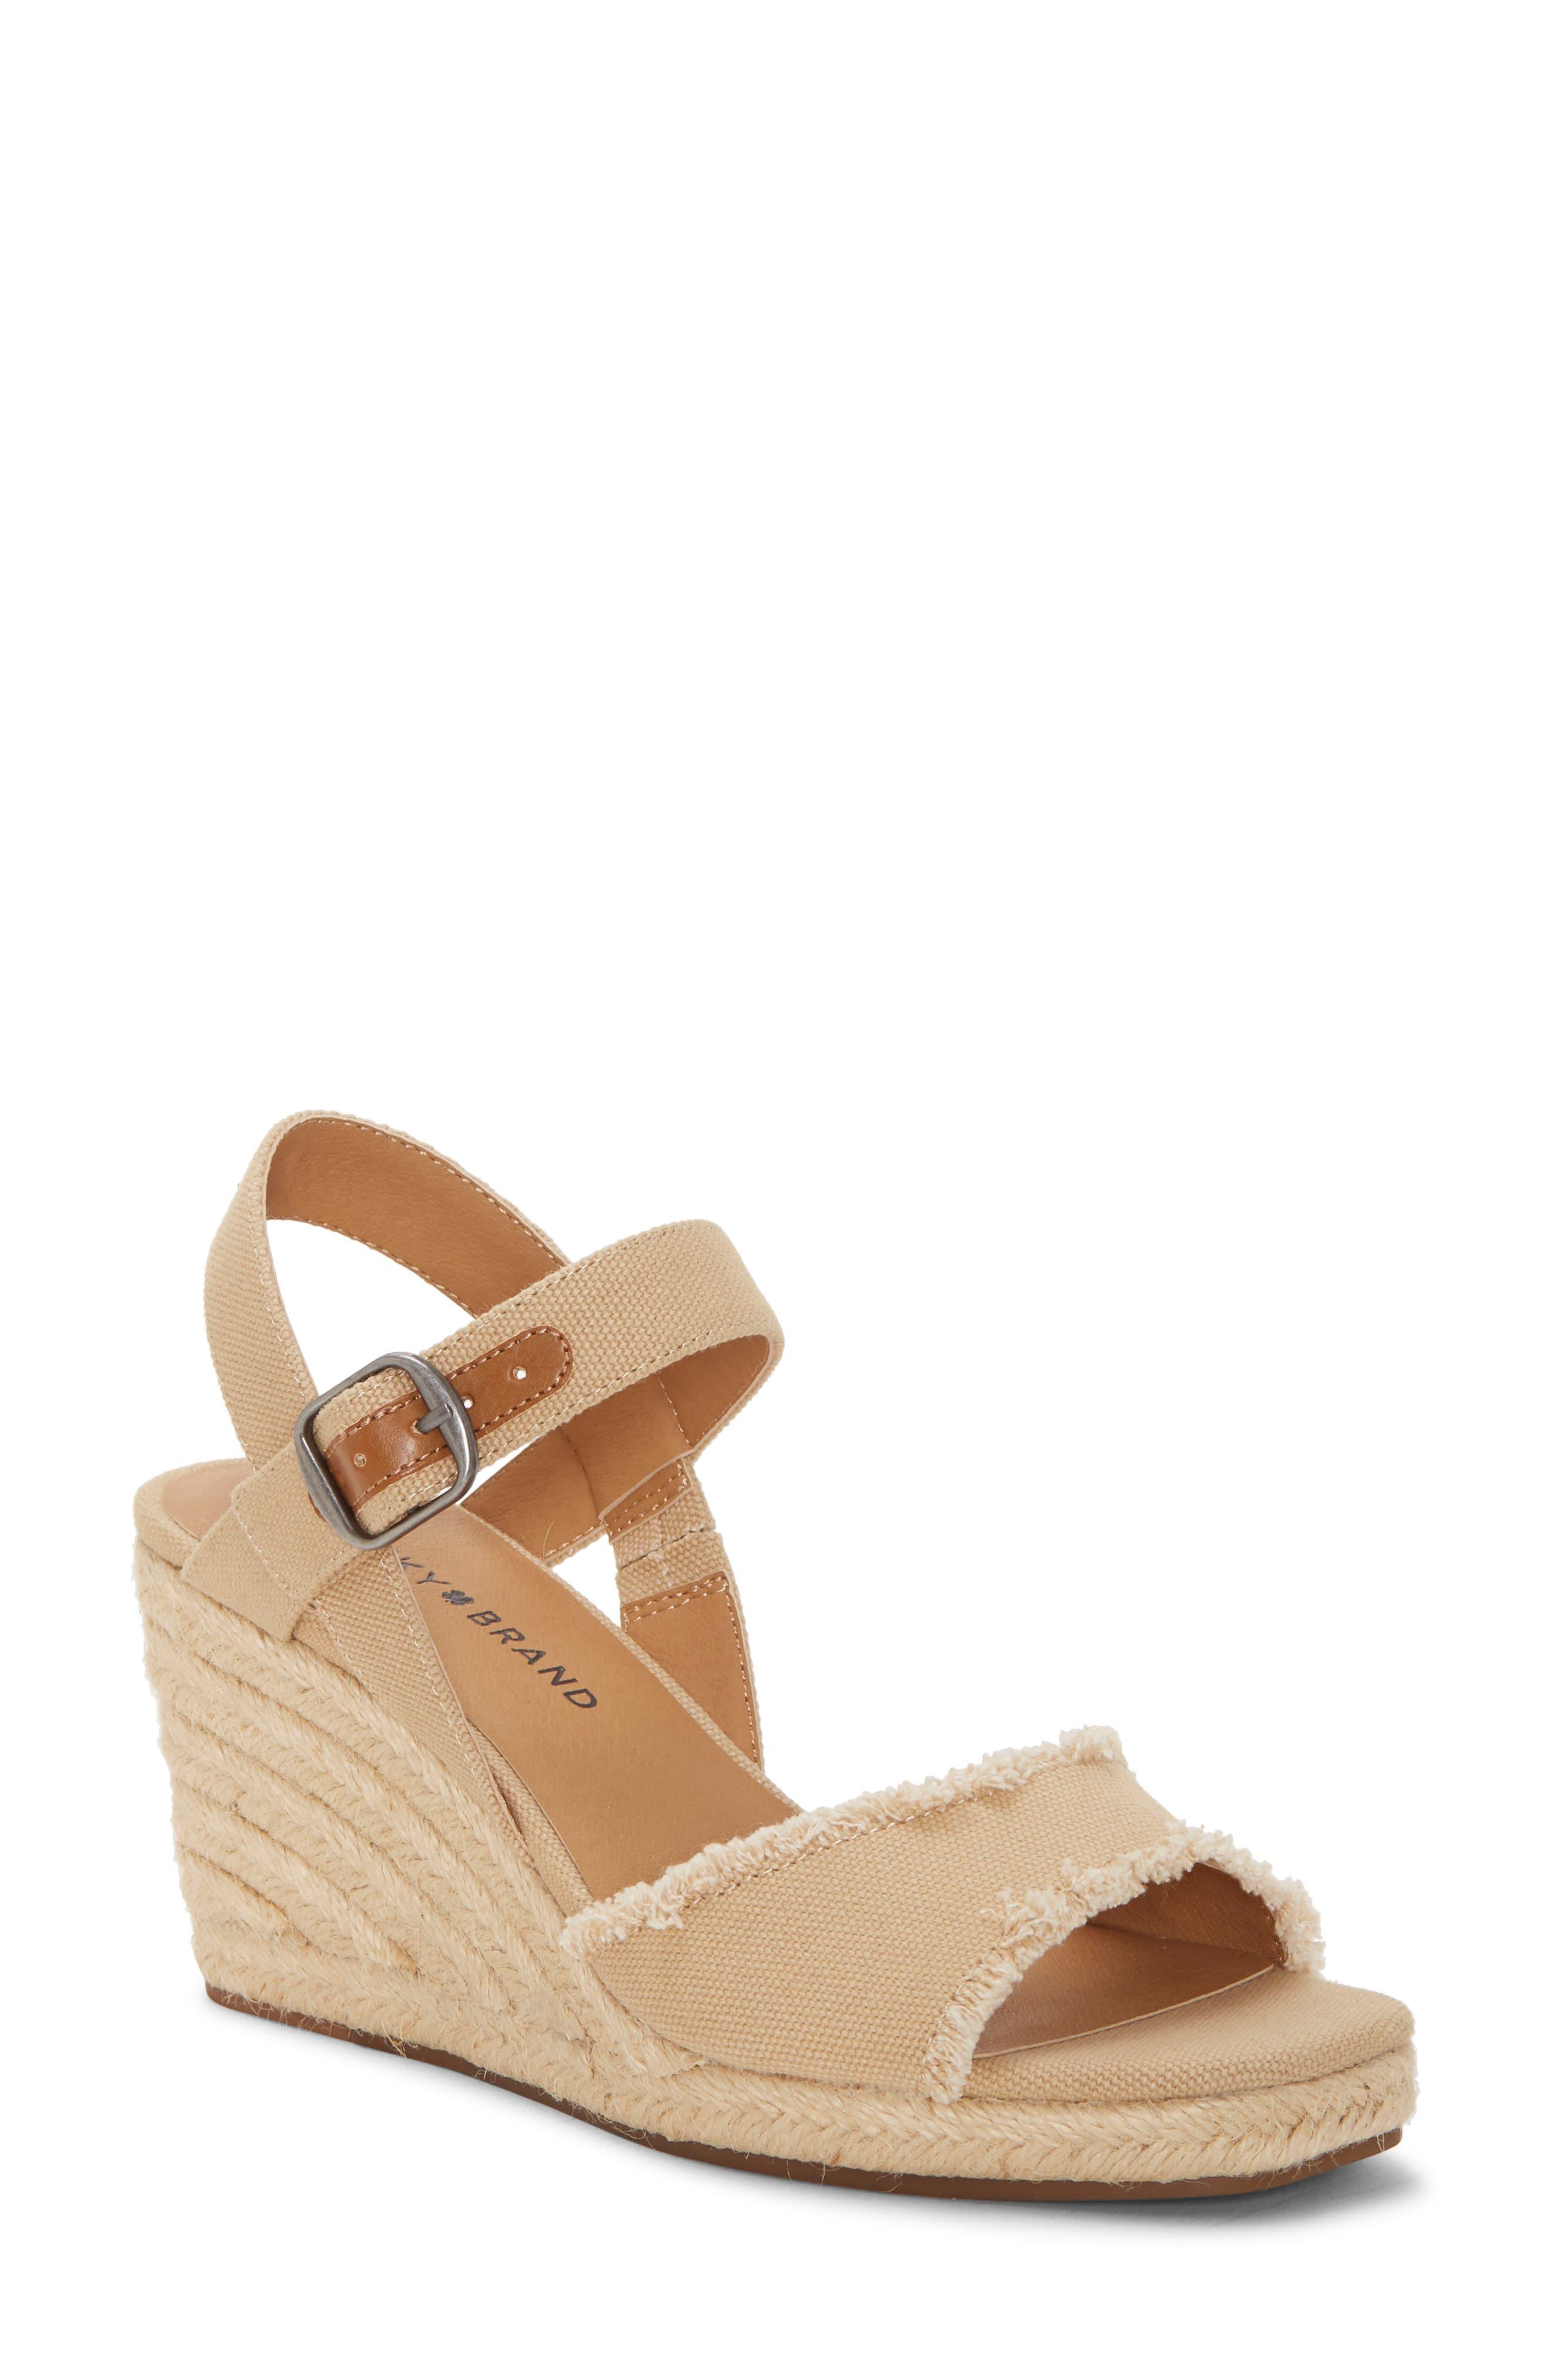 Mindra Espadrille Wedge Sandal, Main, color, TAVERTINE FABRIC